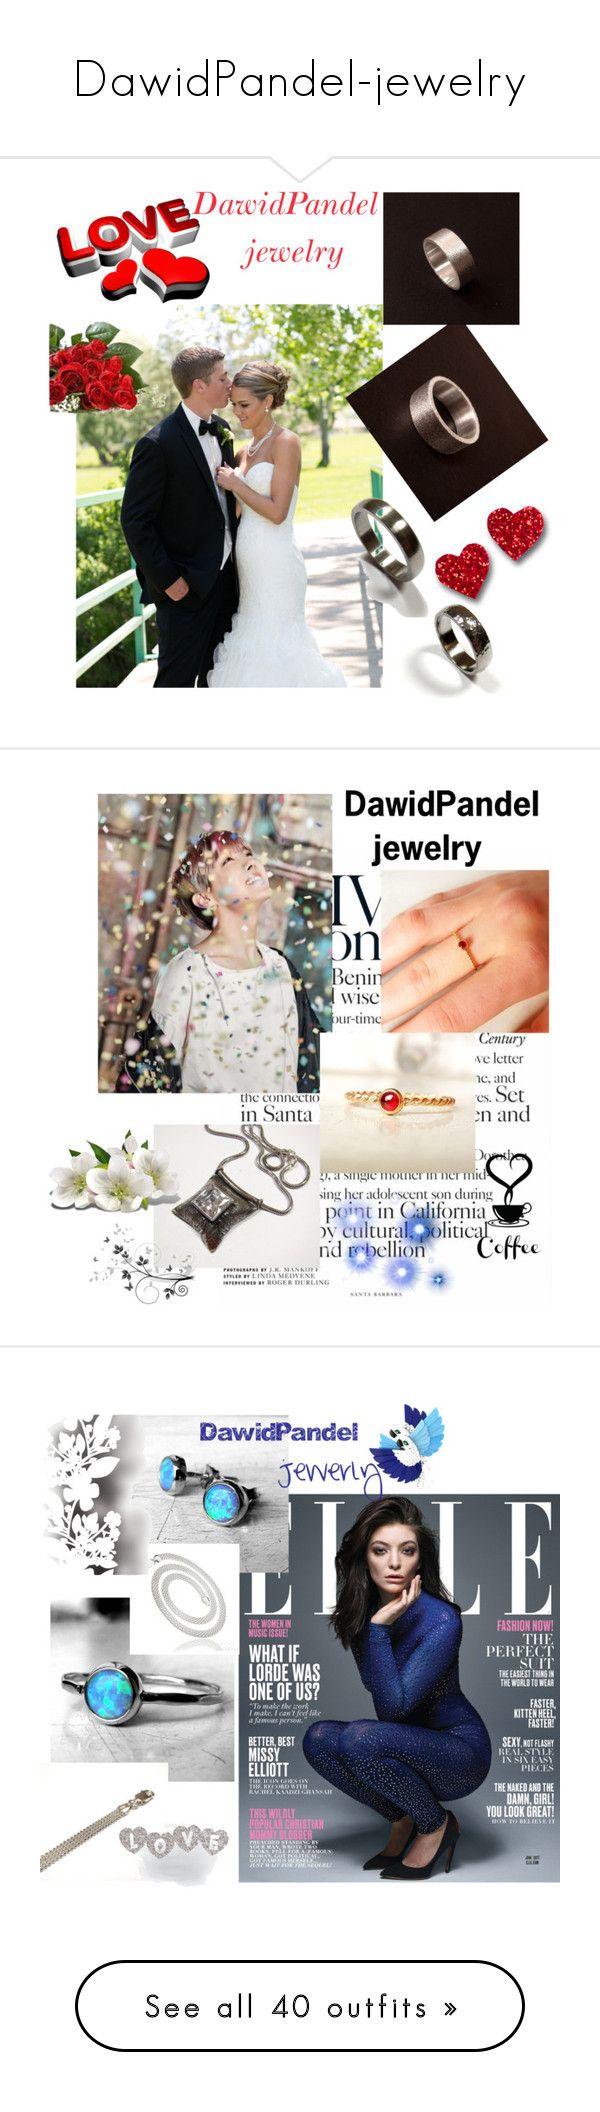 """DawidPandel-jewelry"" by alma-ja ❤ liked on Polyvore featuring WALL, Arca, Élitis, Massif, Others Follow, Rachel Trevor-Morgan, Laurence Dacade, Zigi Soho, ASOS and Fendi"